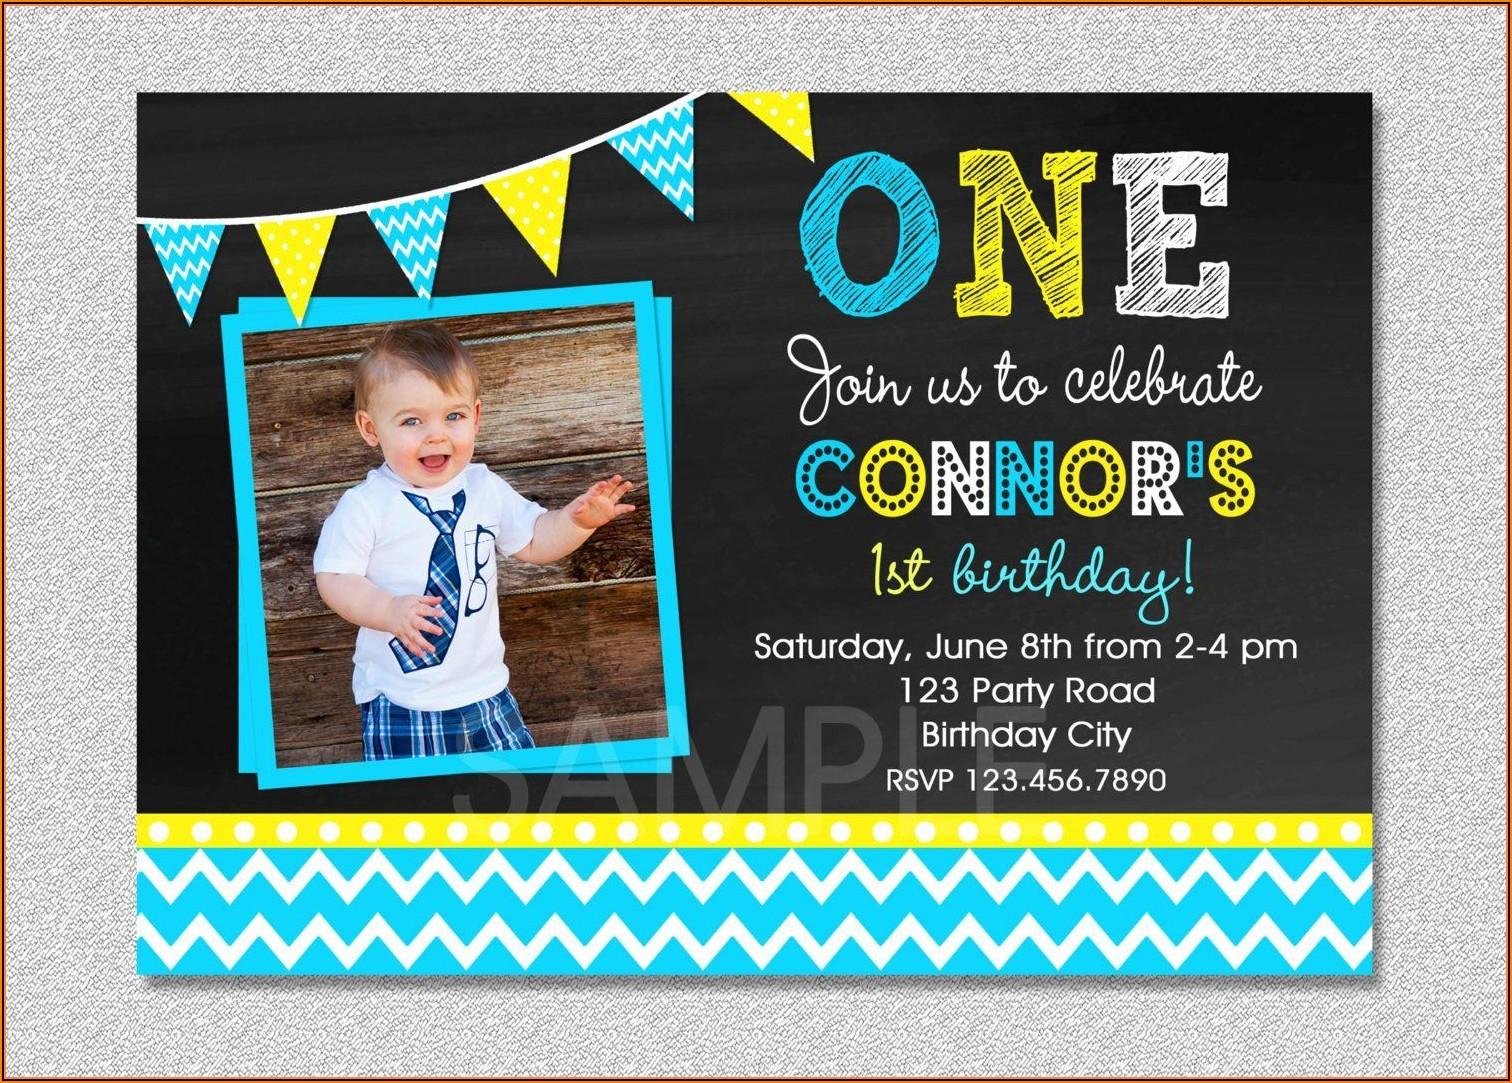 Invitation Template For Birthday Boy